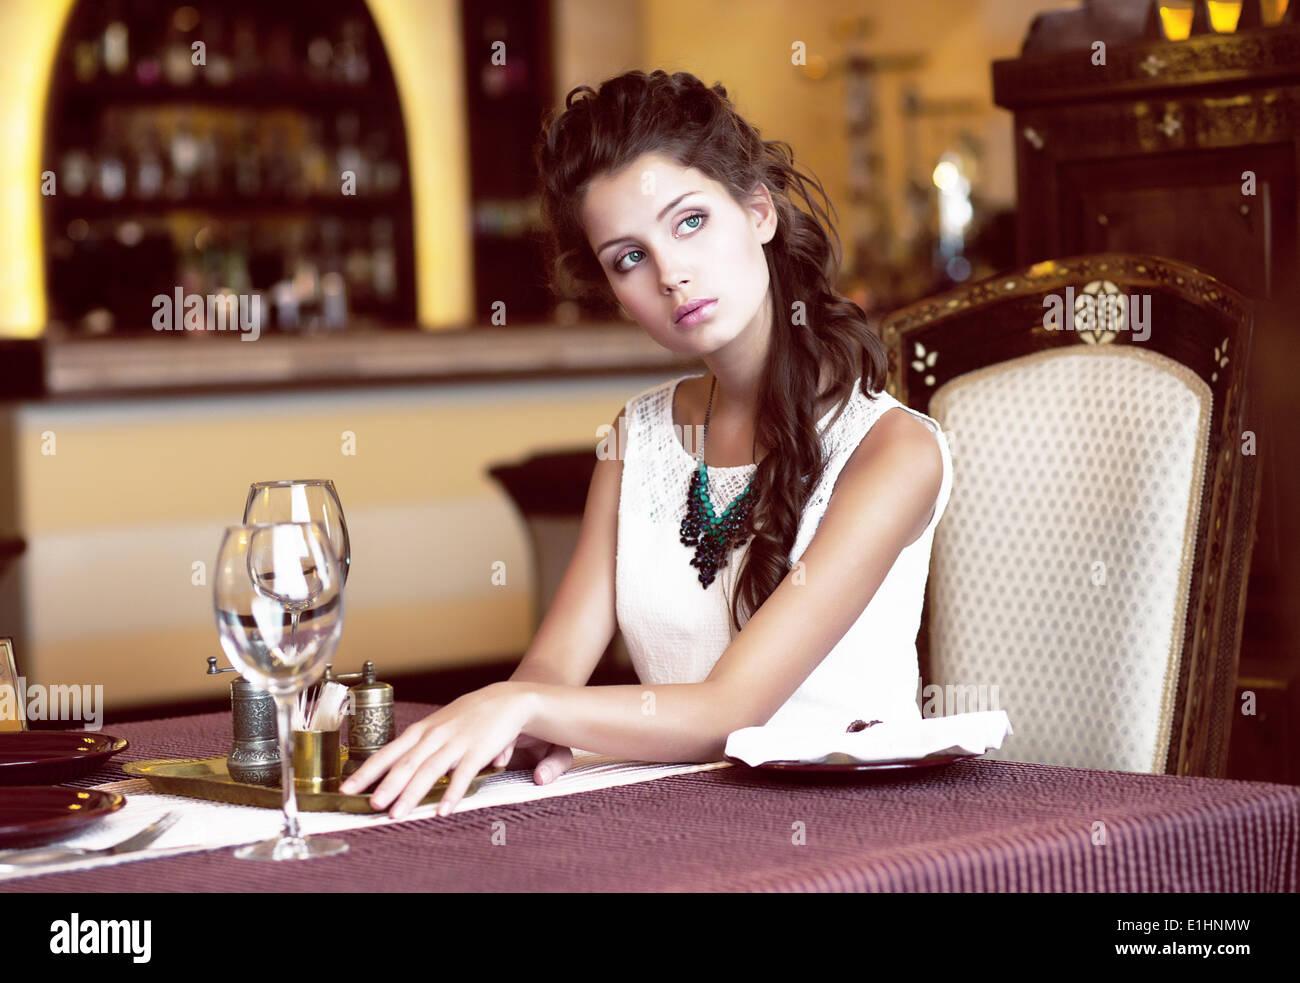 Luxury. Classy Romantic Woman in Restaurant. Expectancy - Stock Image